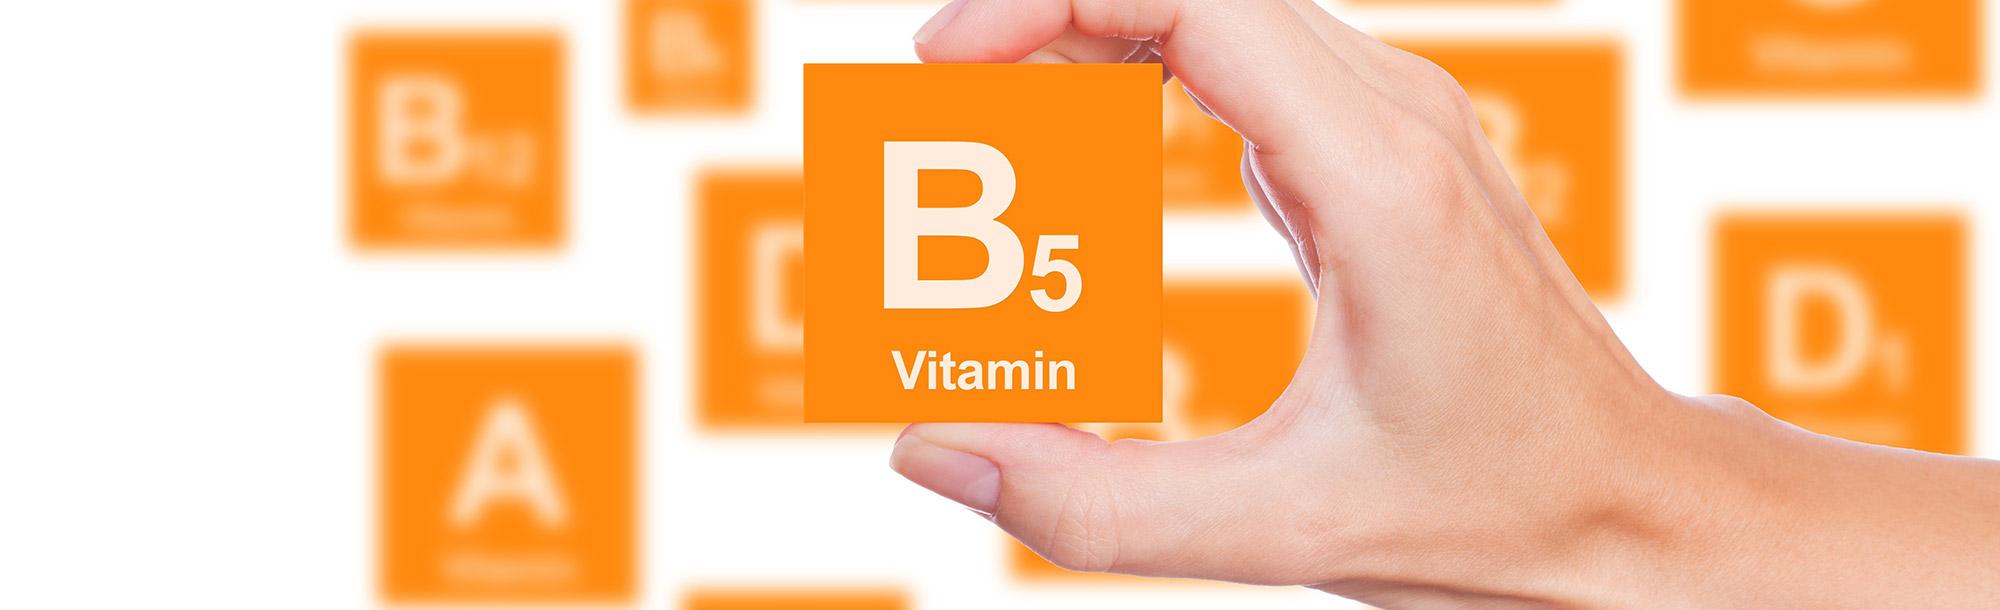 The Amazing Benefits of Vitamin B5 (Pantothenic acid)